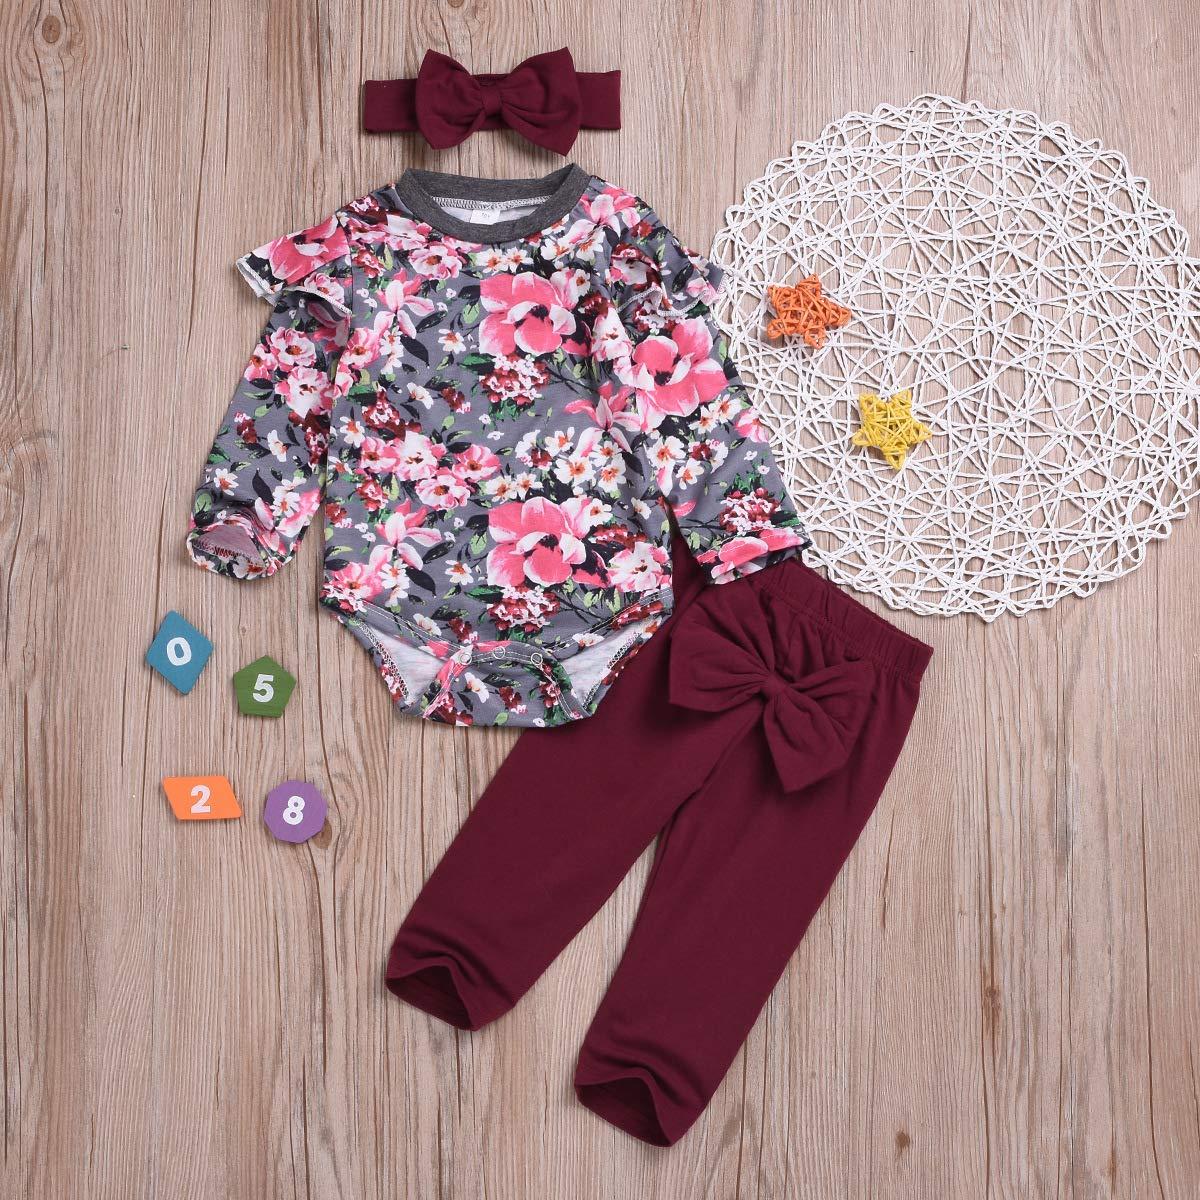 20fade865 Amazon.com  Newborn Baby Girls Ruffle Romper Floral Pants Headband ...